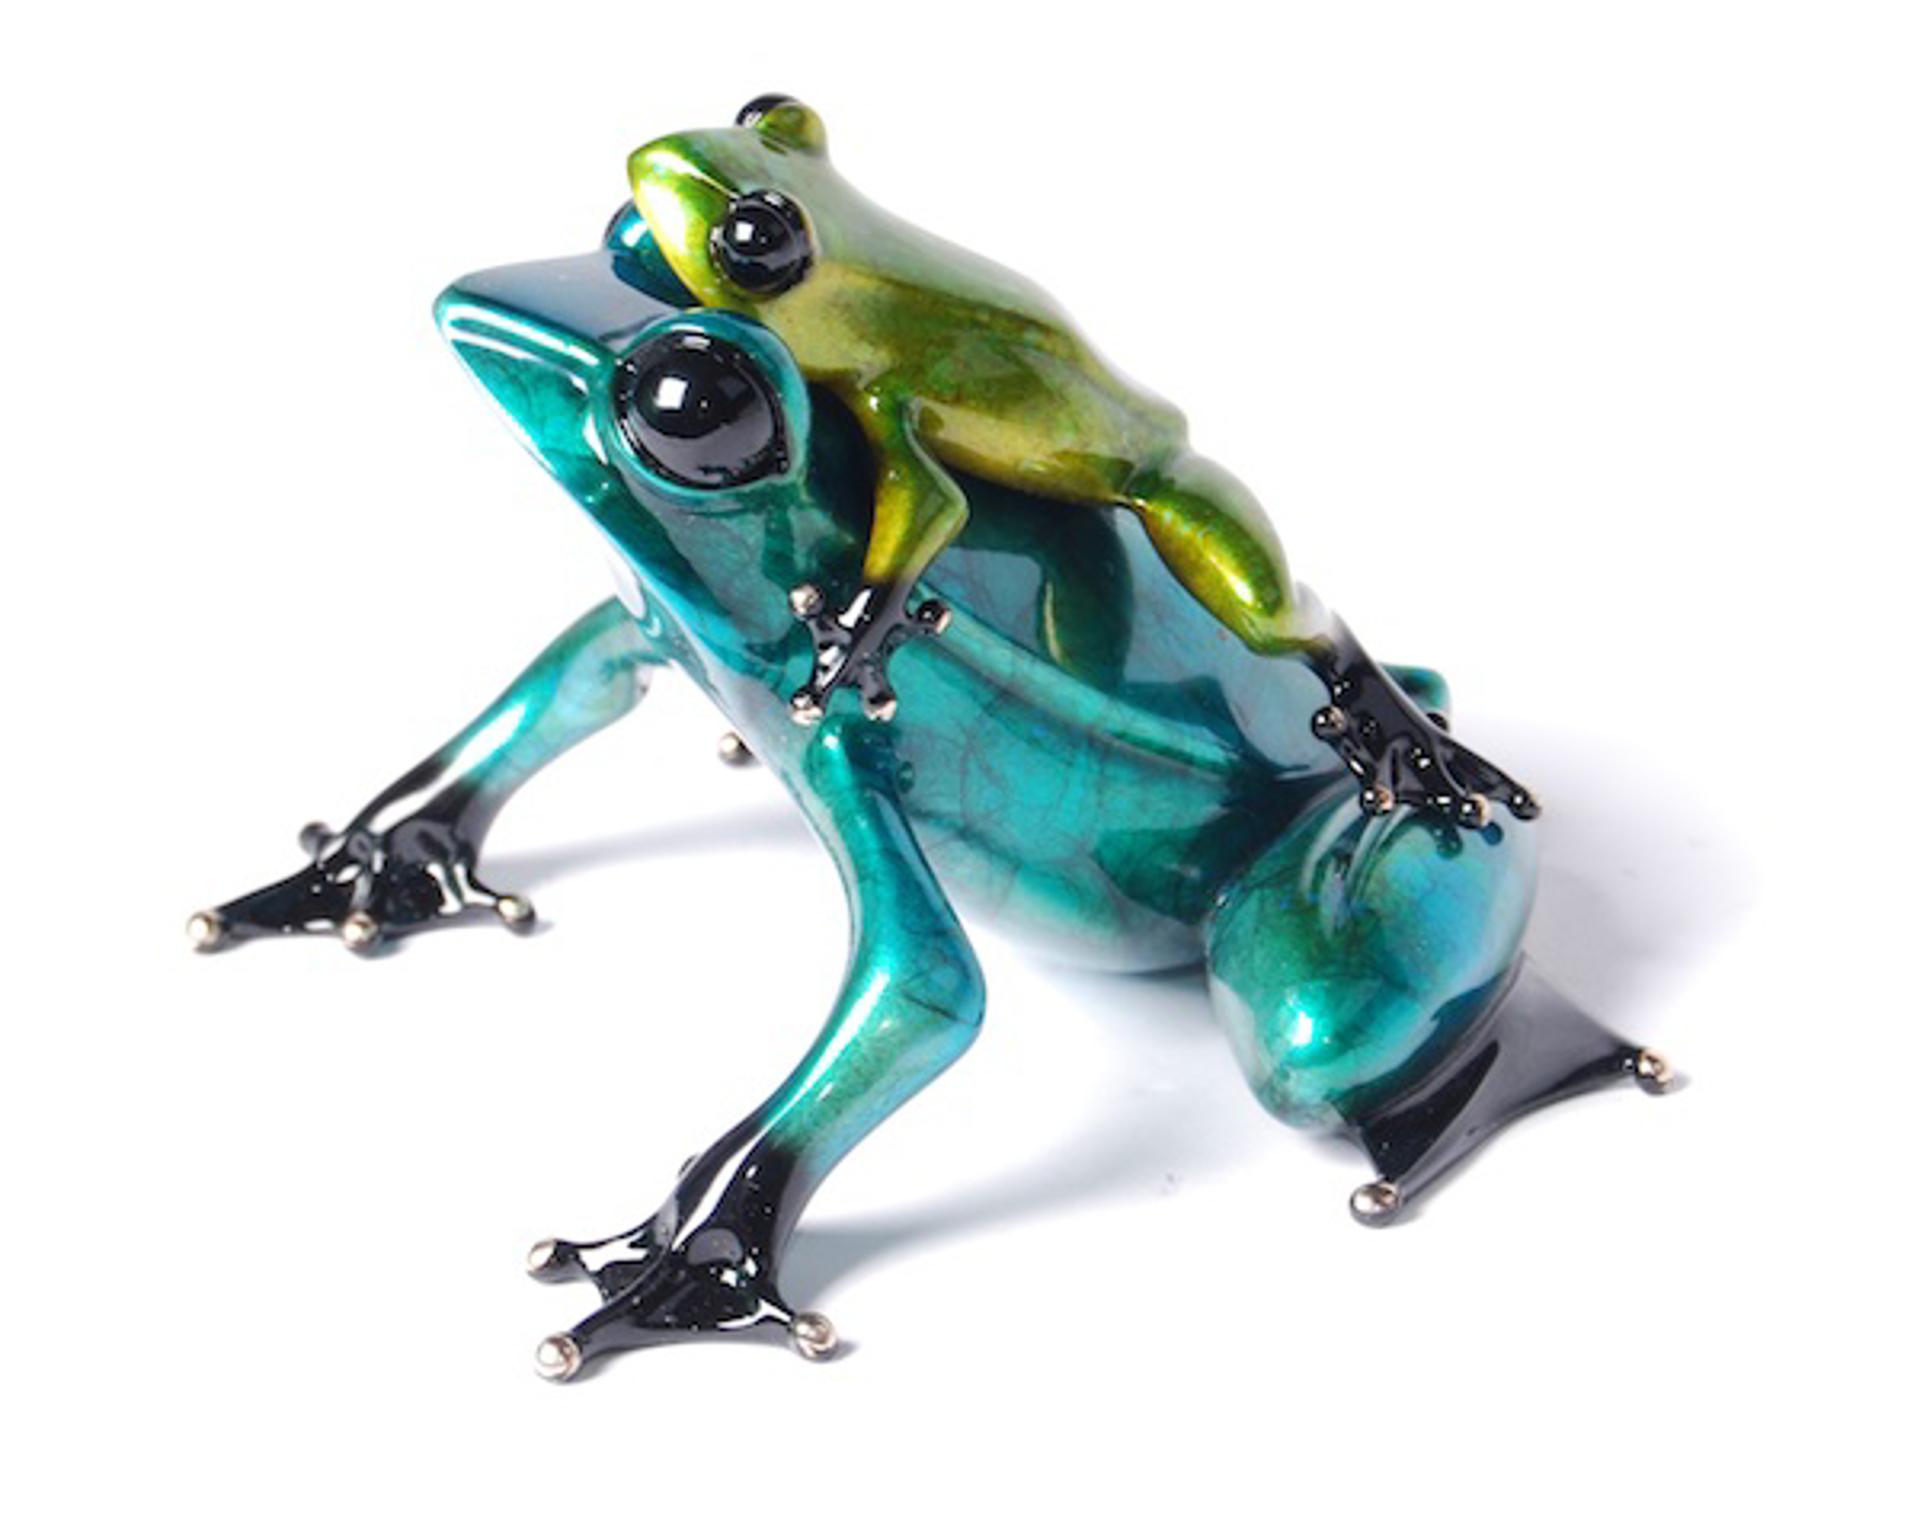 Joy Ride by The Frogman